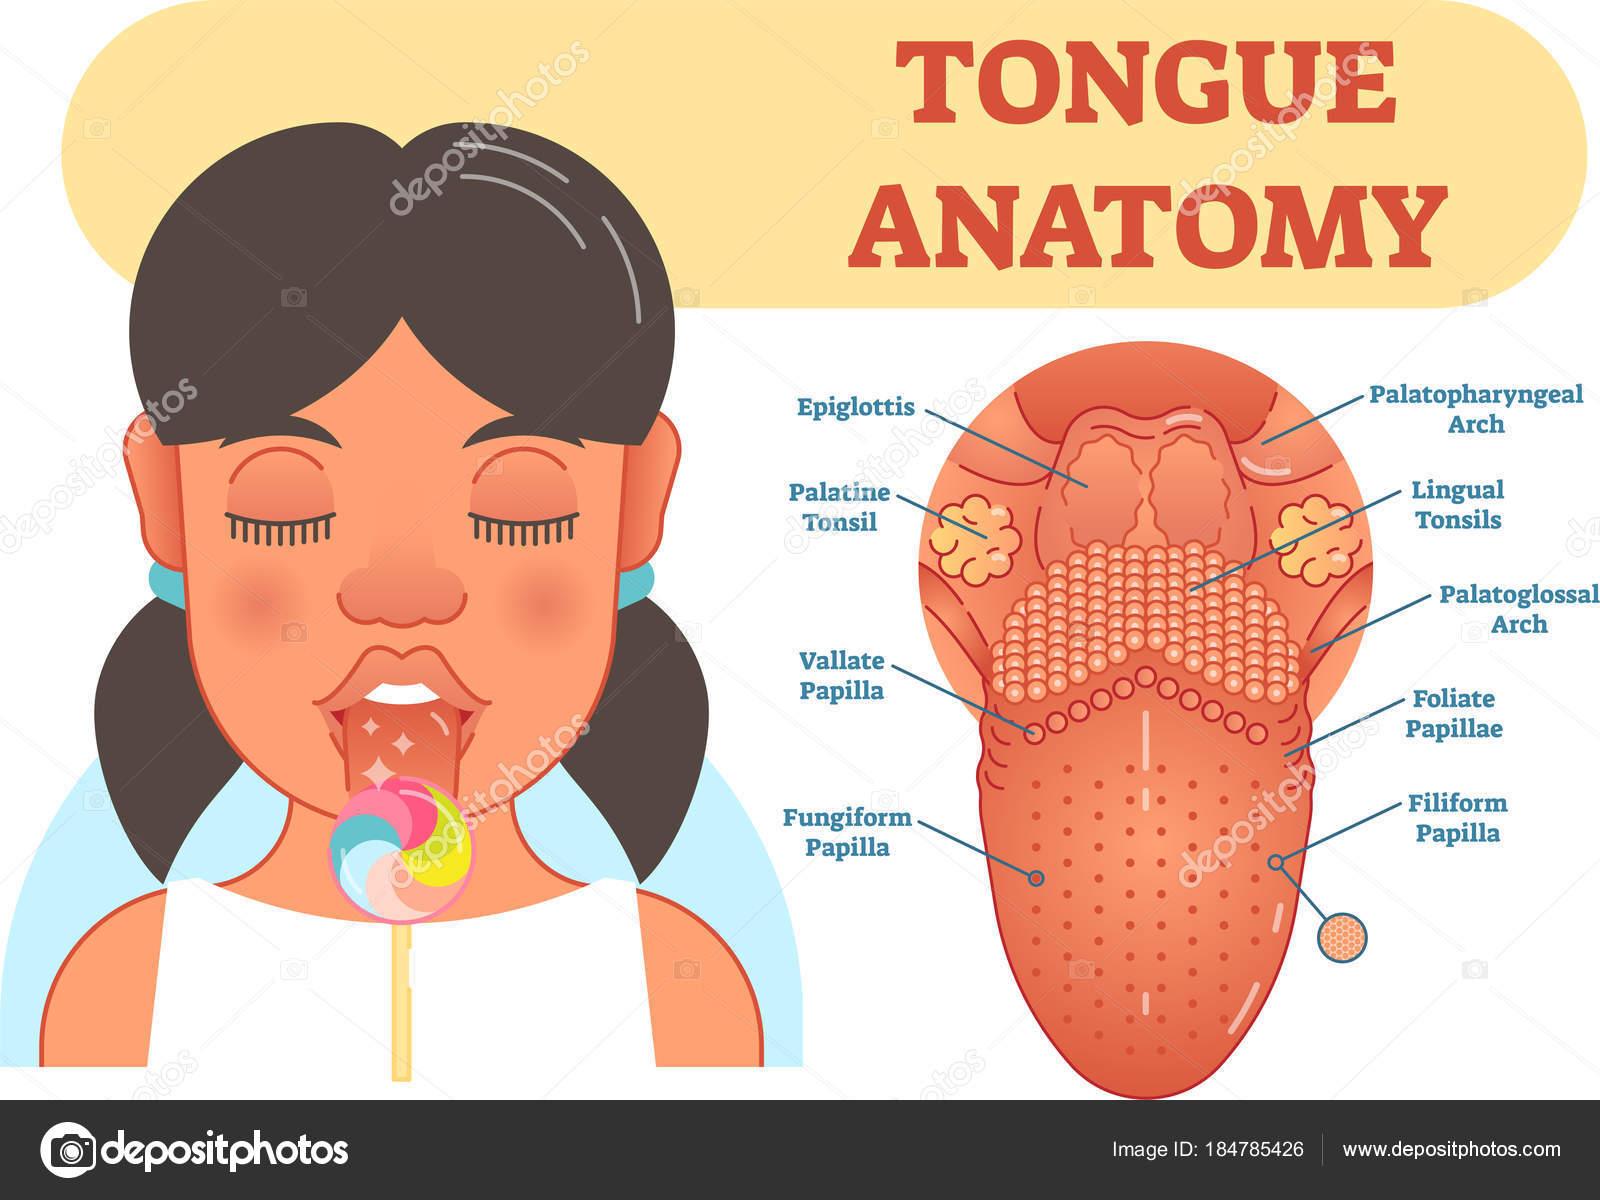 Tongue anatomy medical vector illustration diagram stock vector tongue anatomy medical vector illustration diagram with epiglottis tonsils and papillas vector by normaals pooptronica